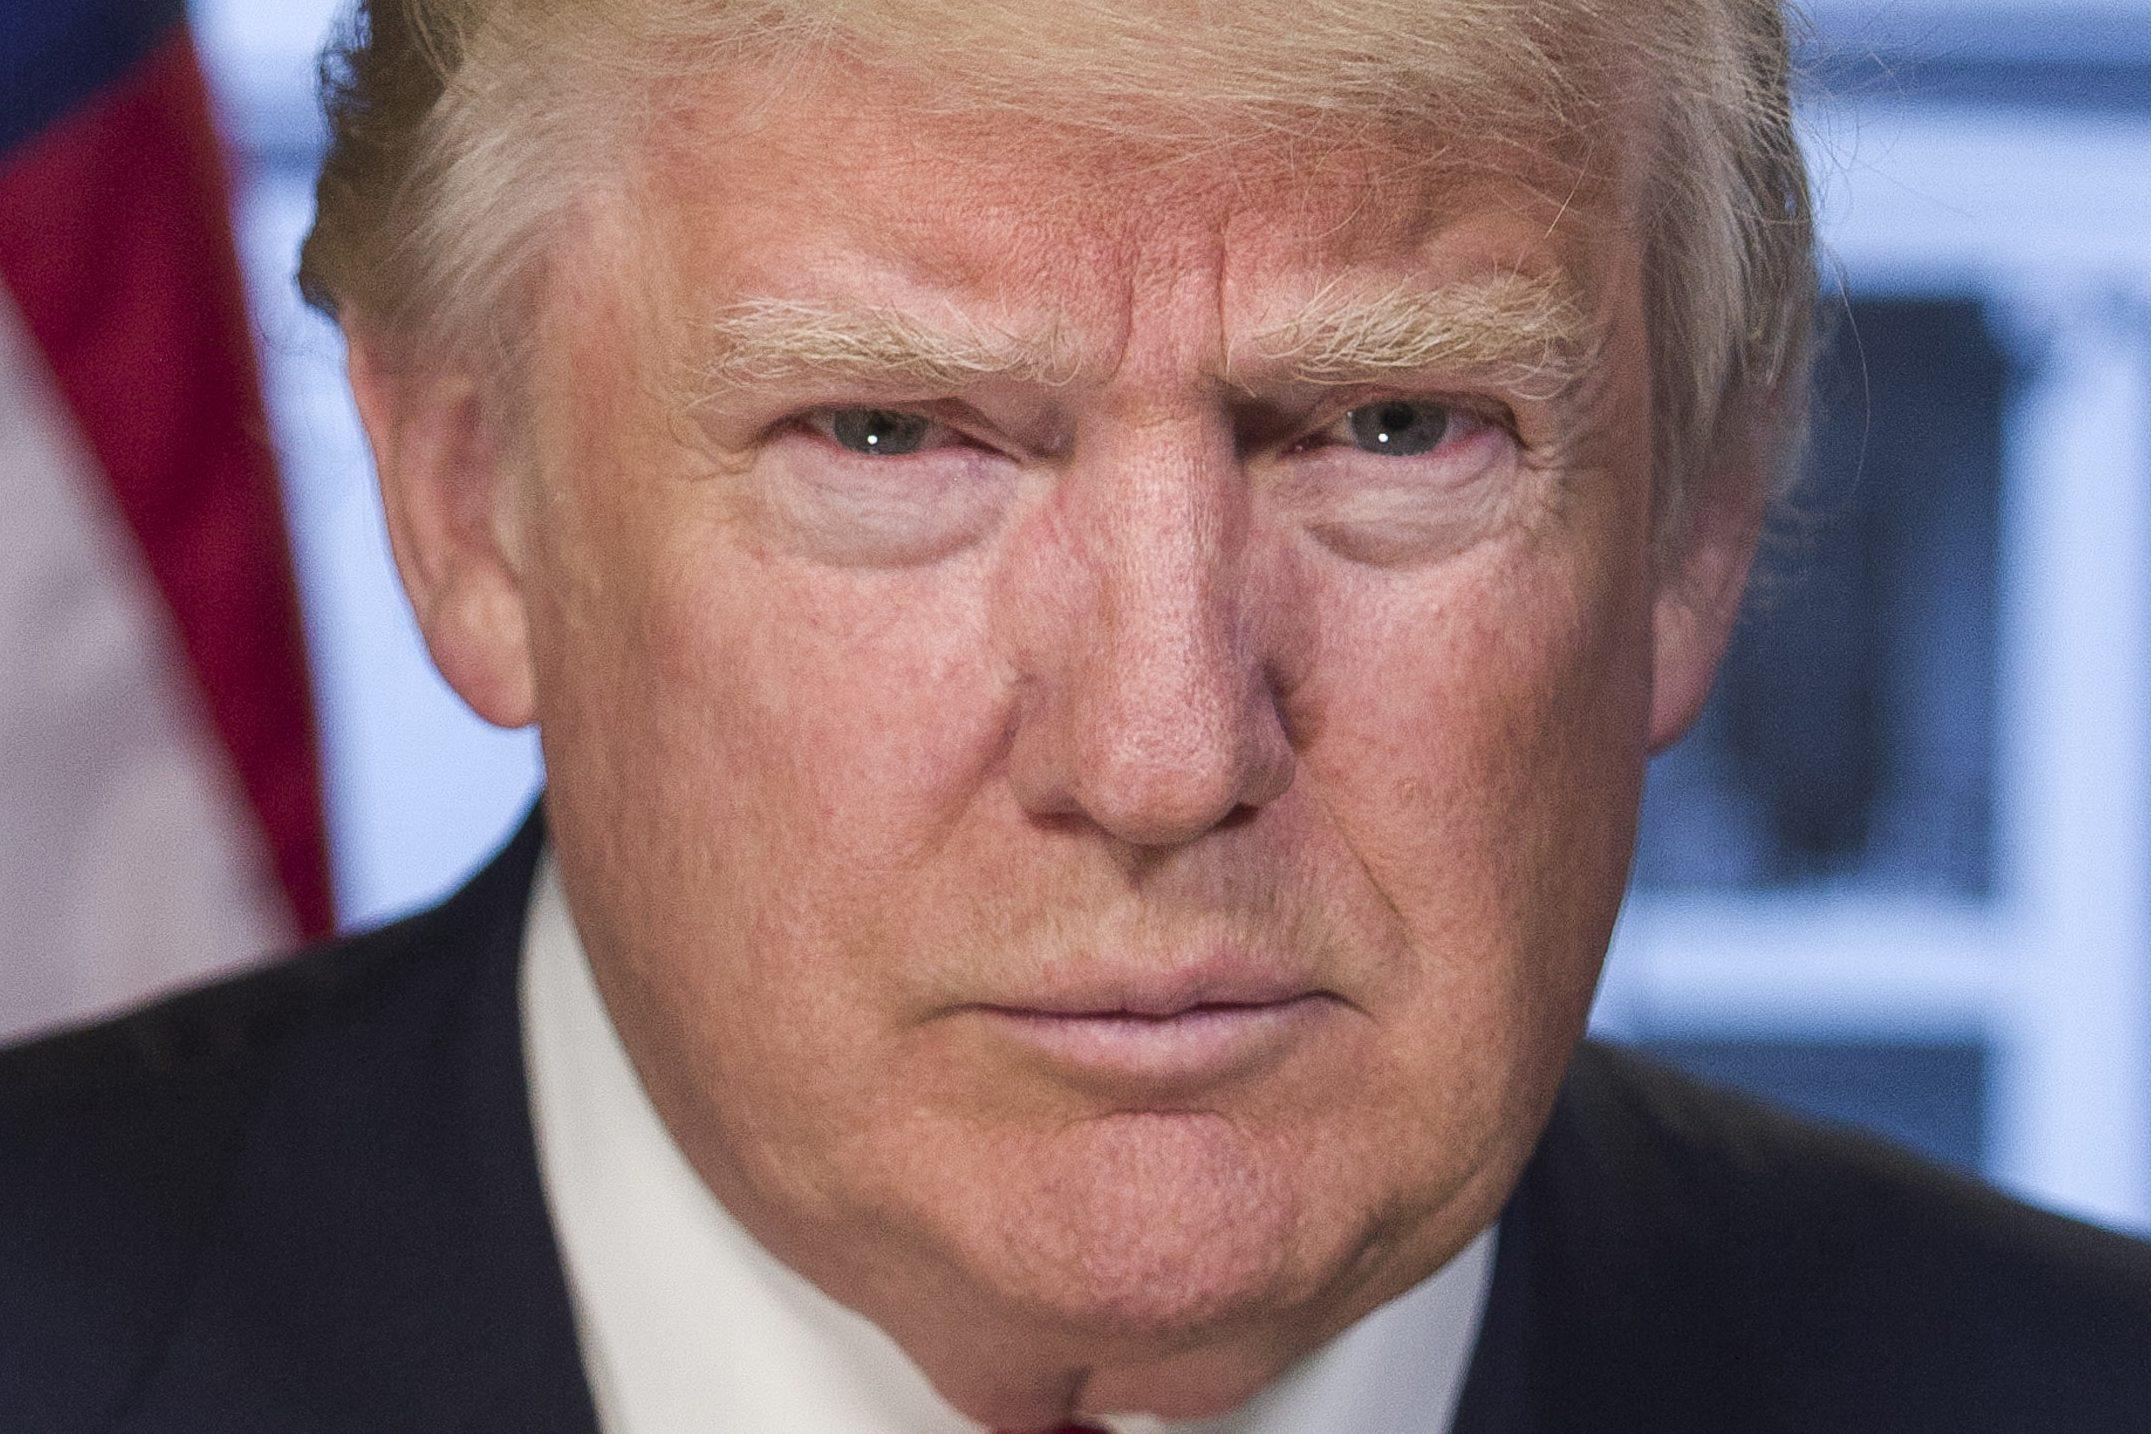 Dies ist das offizielle Porträt des neuen US-Präsidenten Donald Trump. Foto: White House